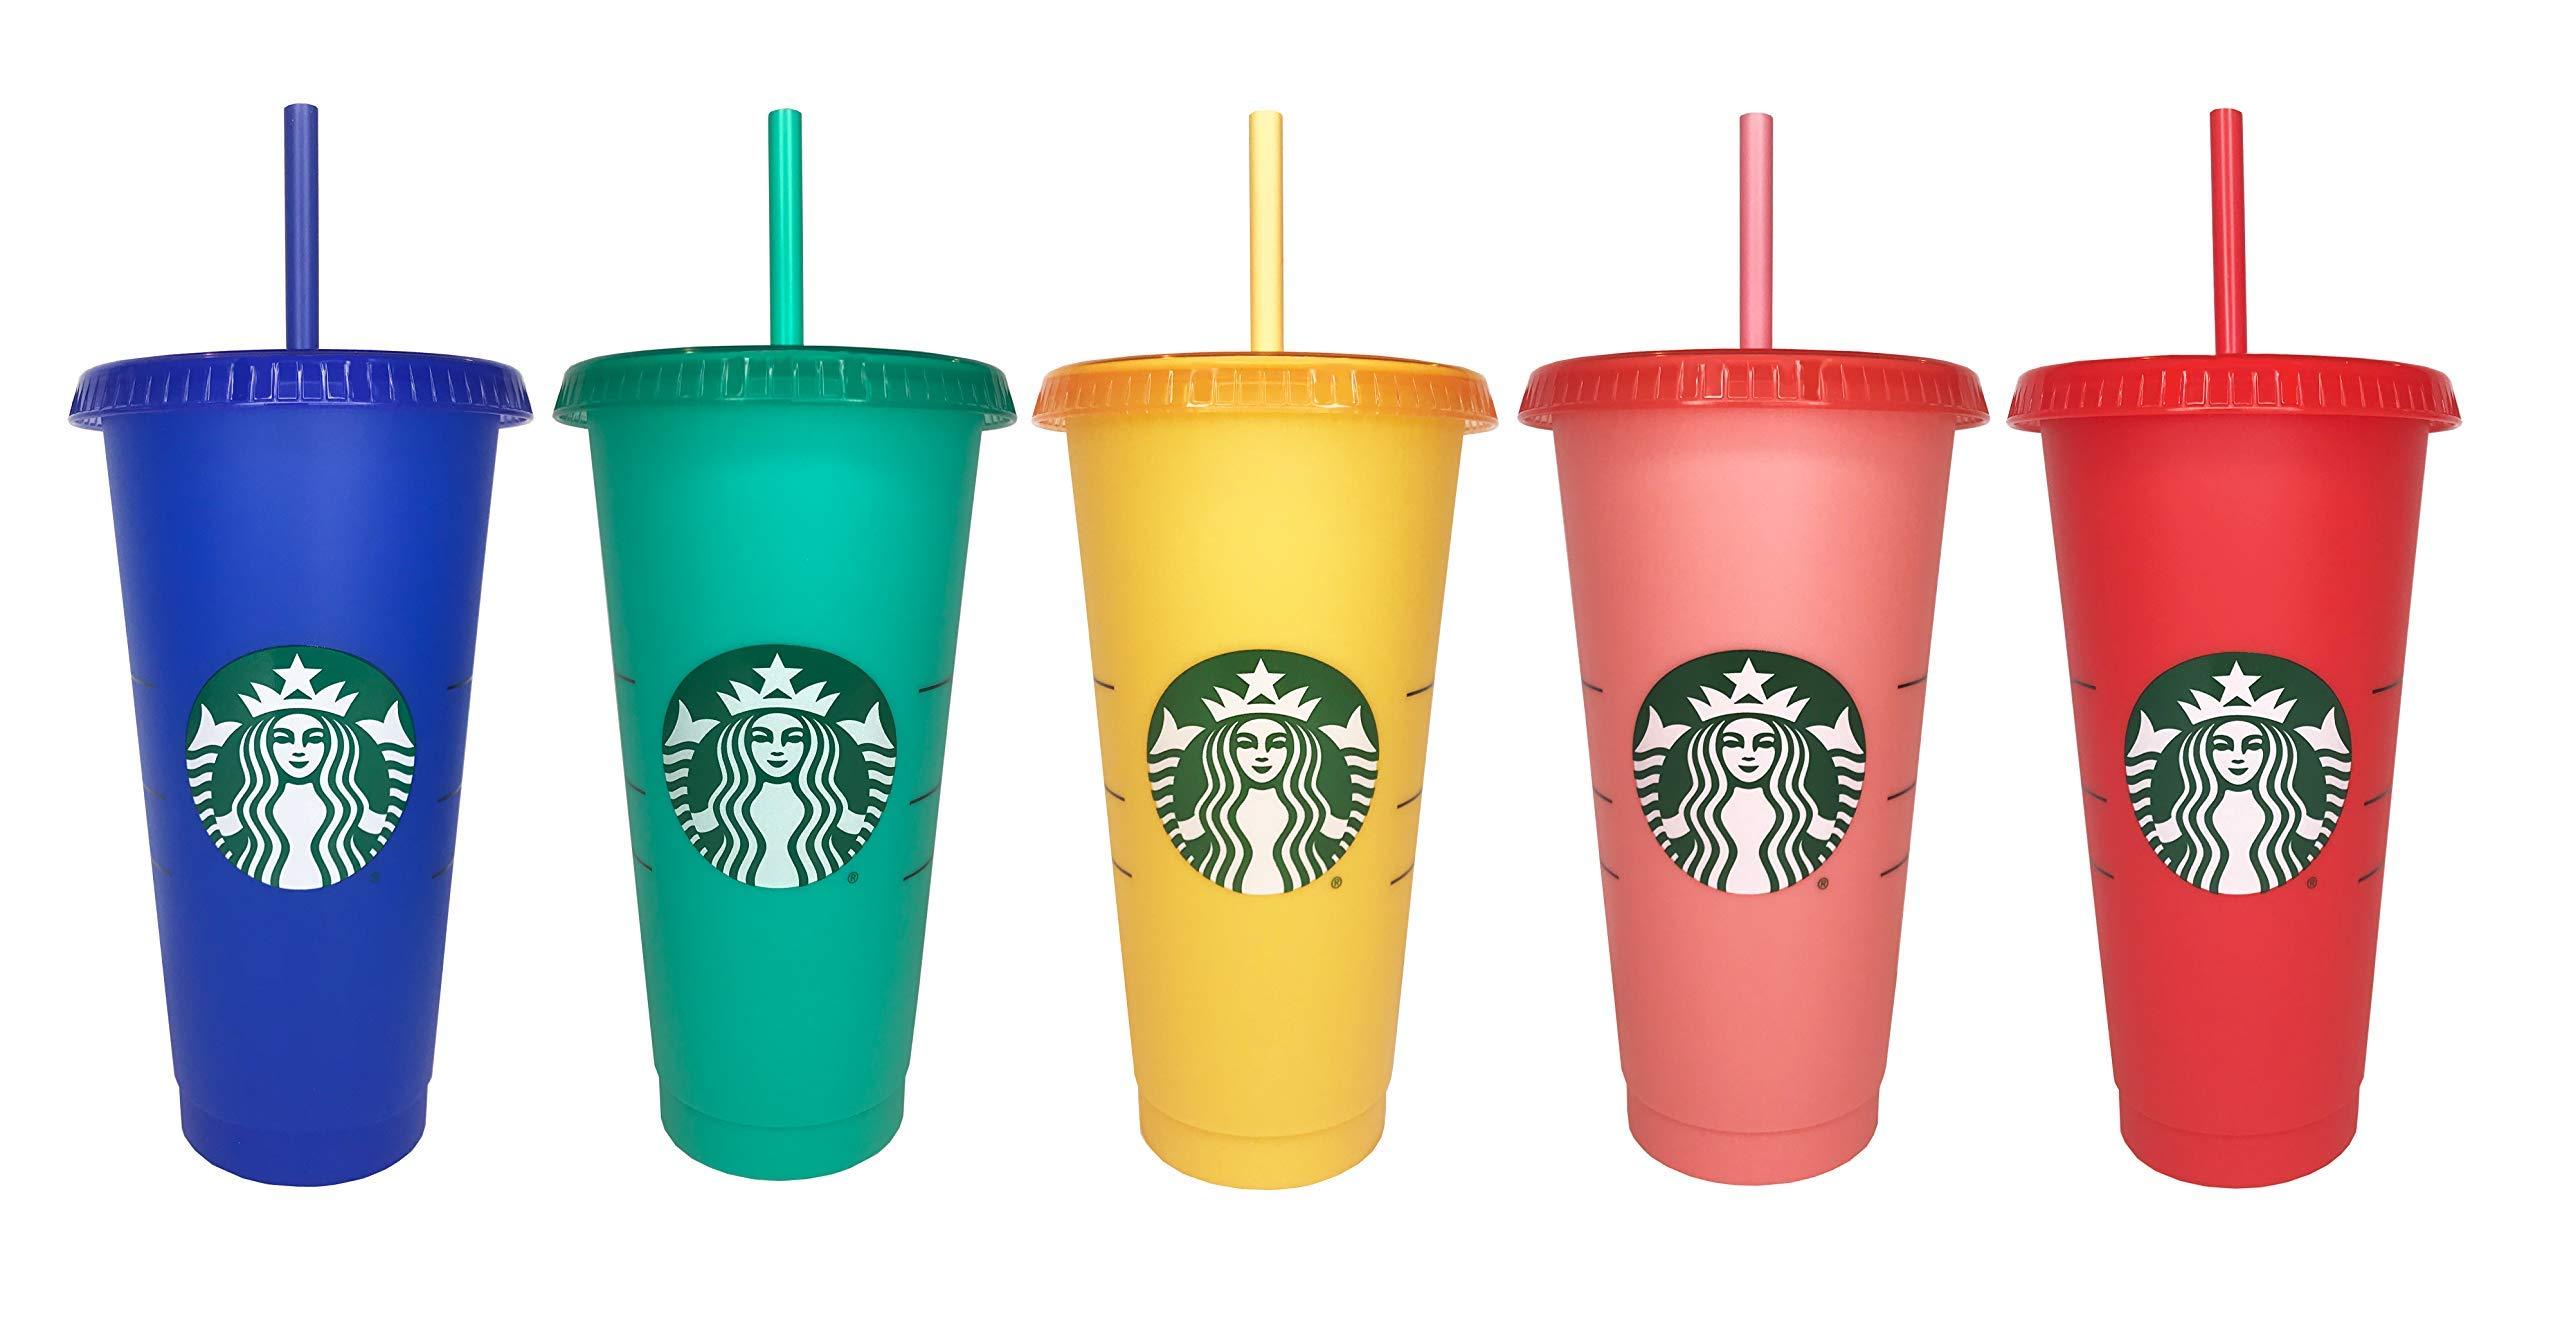 Starbucks 2020 Color Changing Reusable Cold Cups Summer LGBT Pride 24 oz, Set of 5